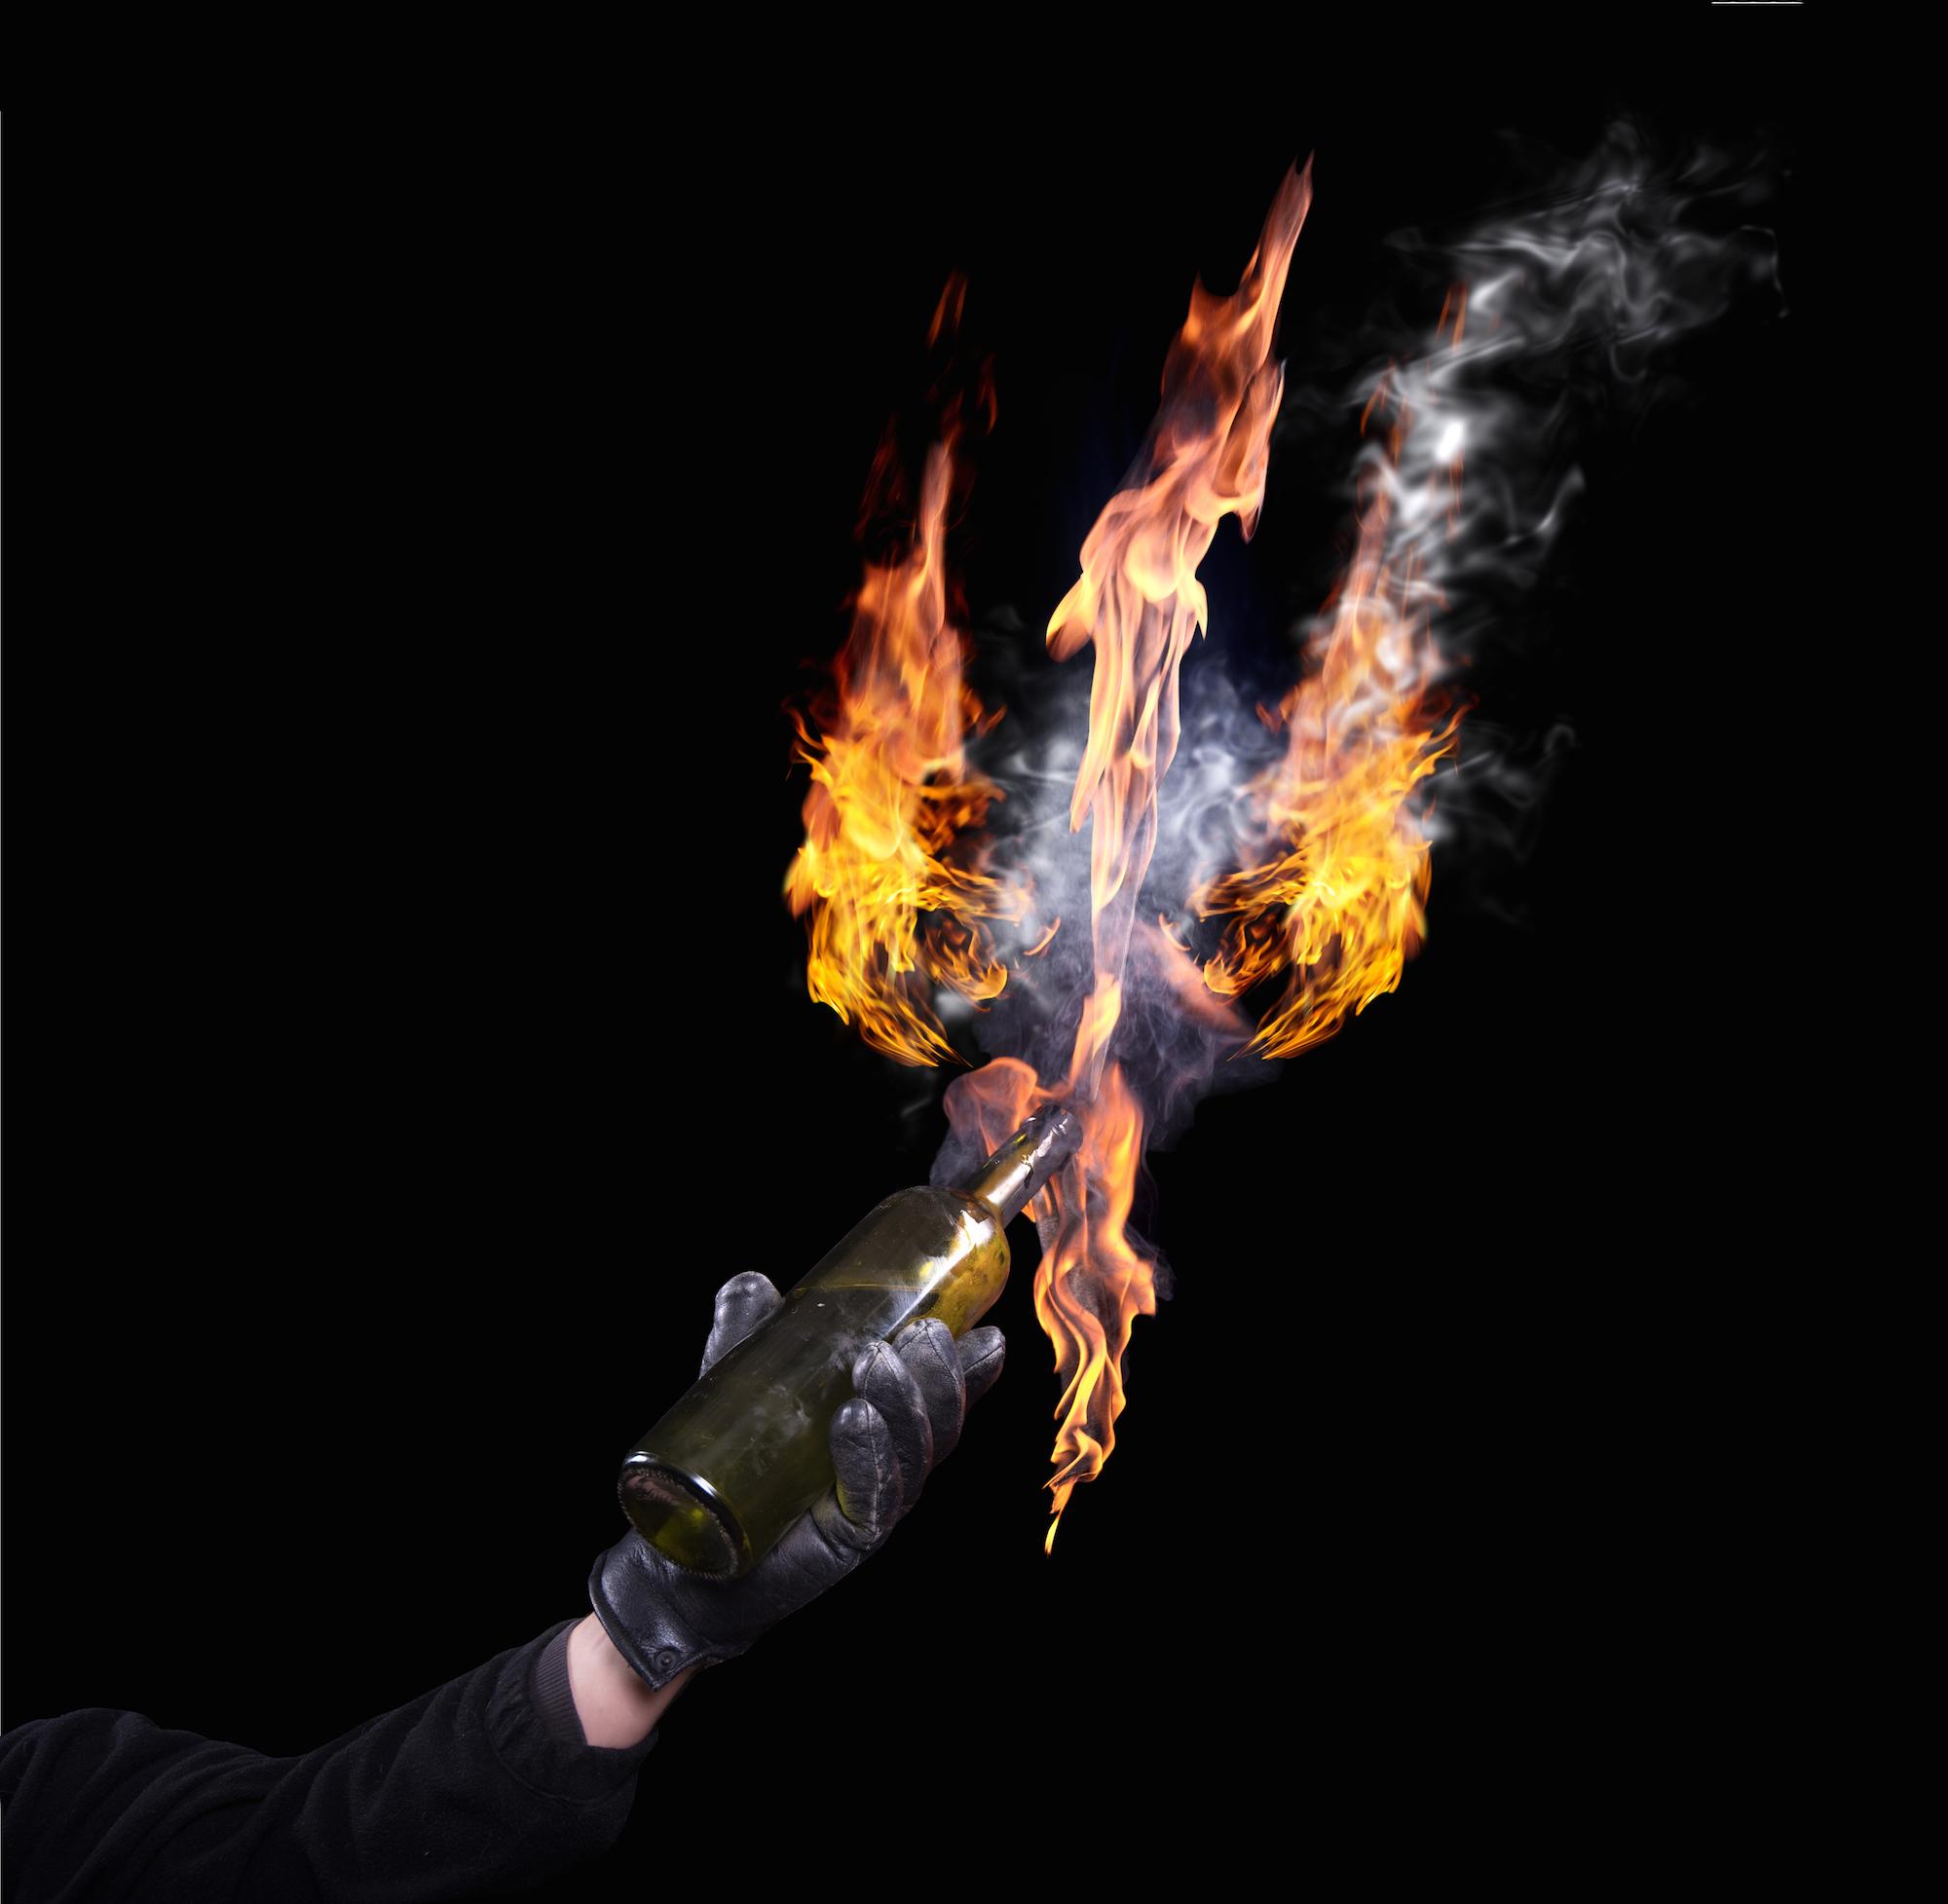 Empire Café hit with molotov cocktail